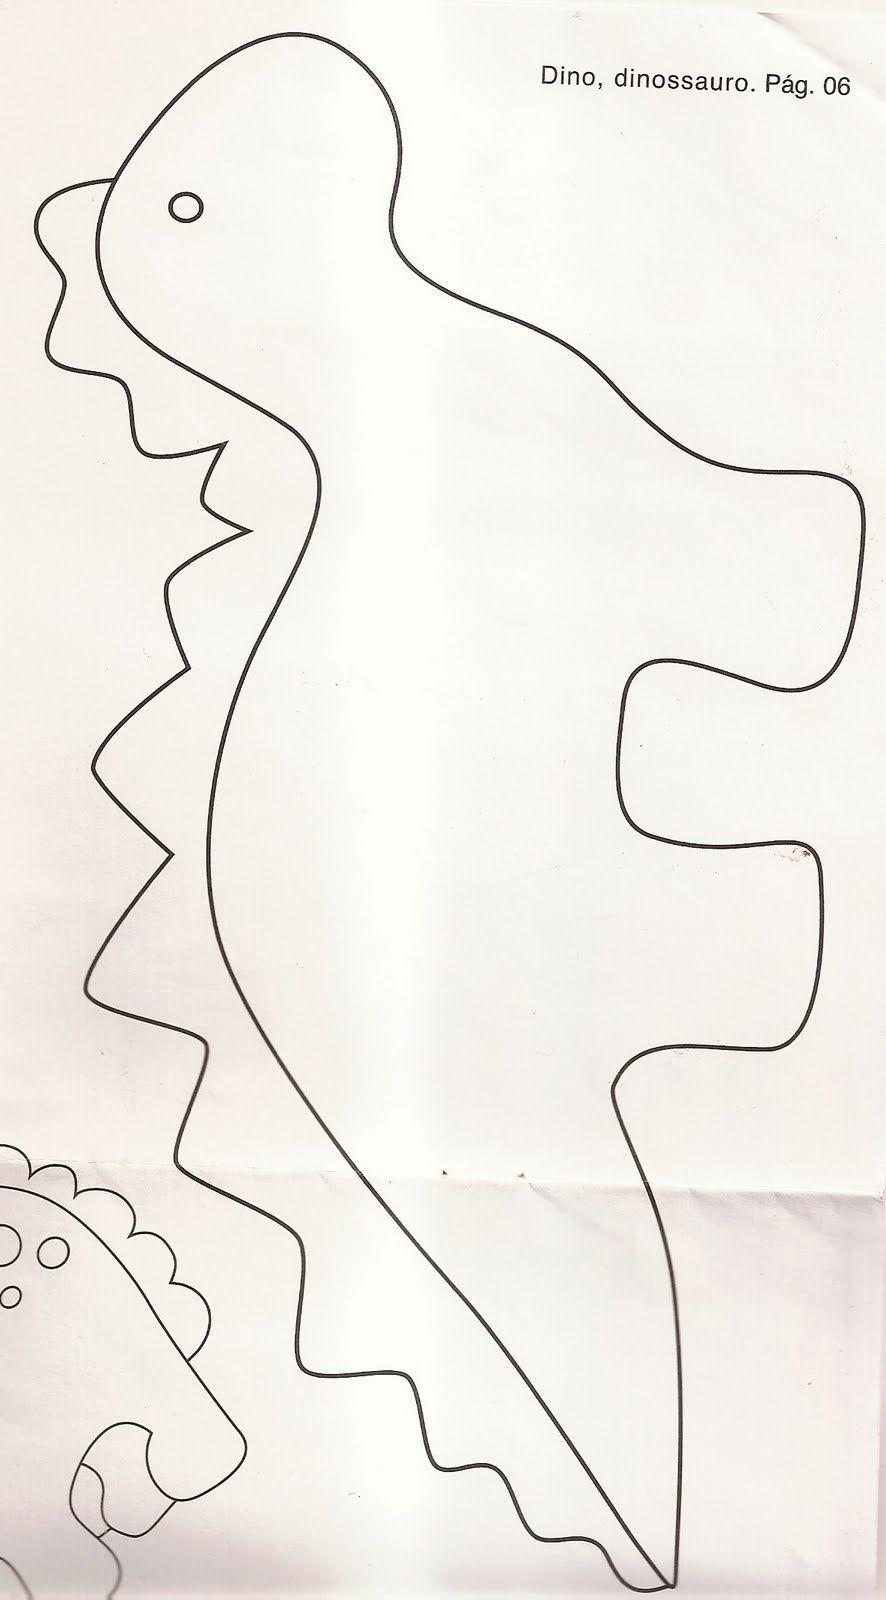 Pin by ♛carol jensen on Applique Template Patterns